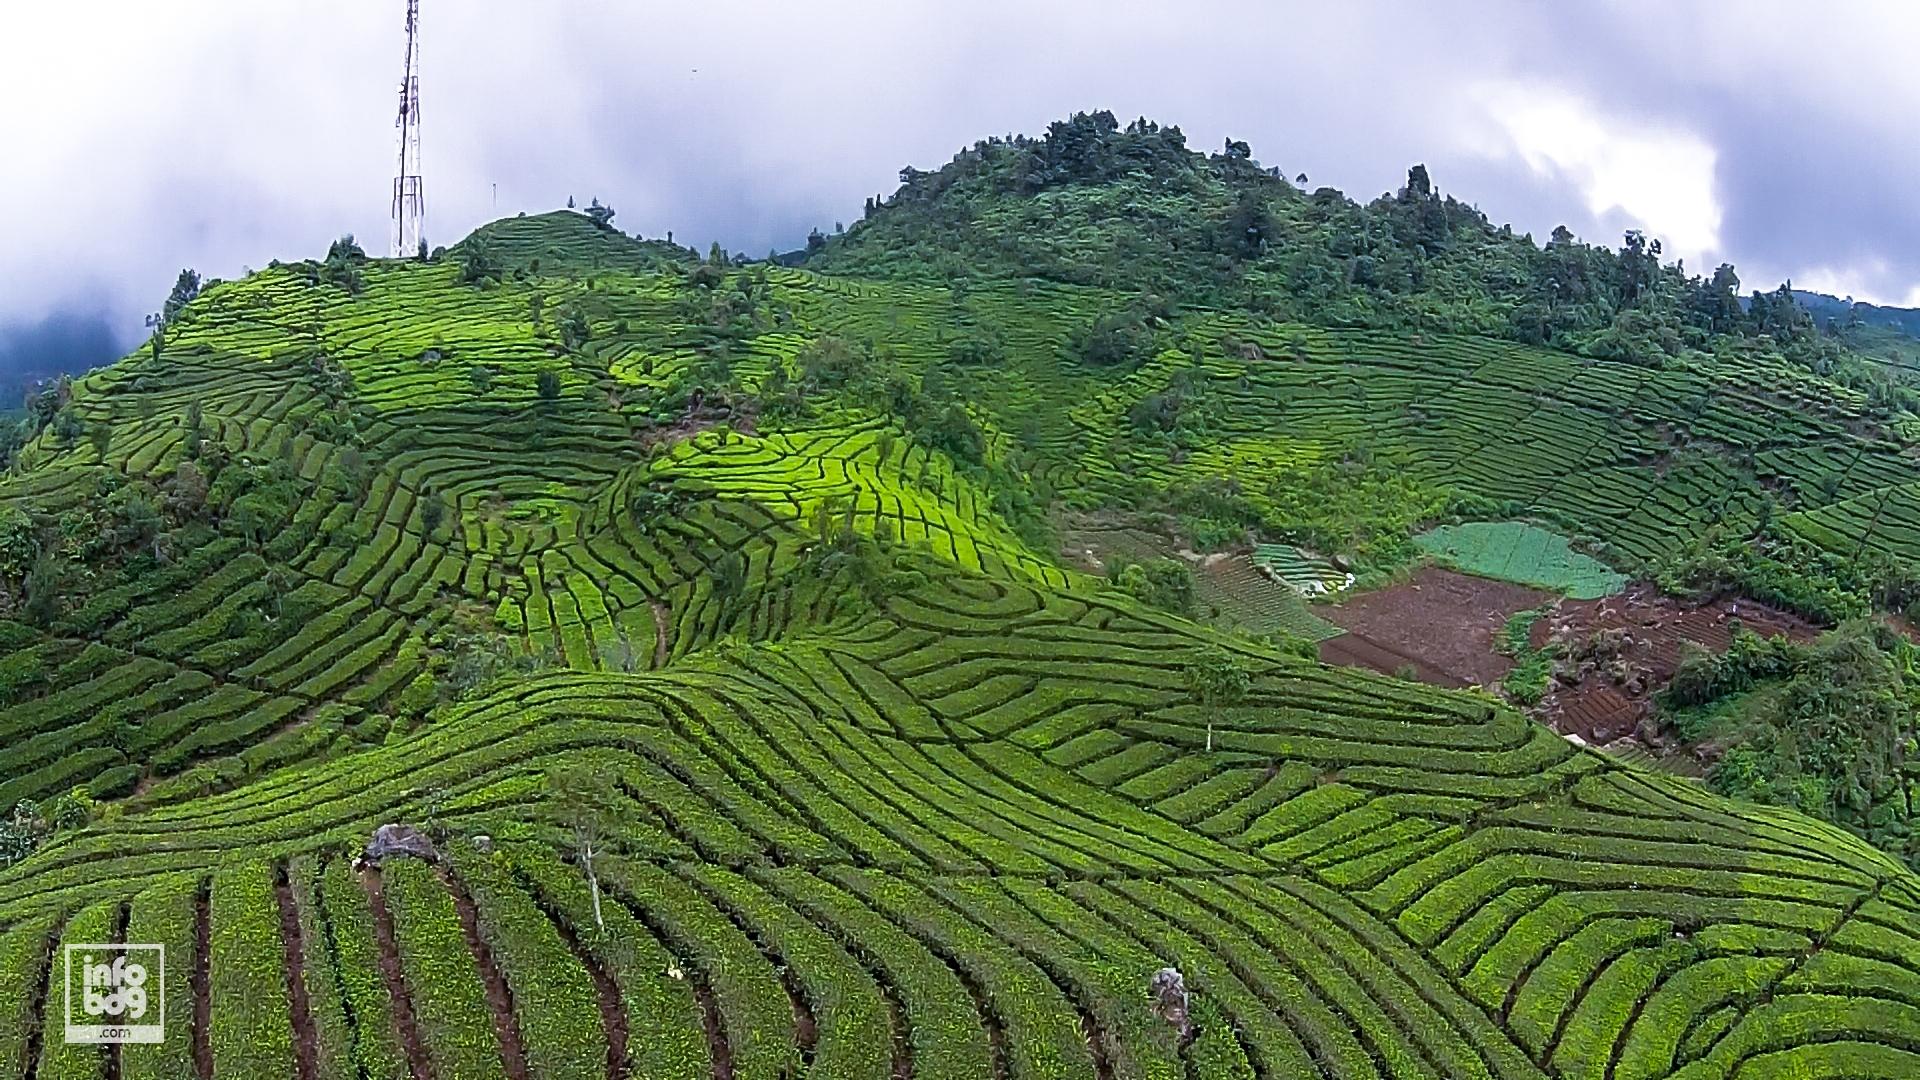 Gambar Kebun Teh Di Ciwidey Yuk Jelajah 6 Kebun Teh Cantik Di Bandung